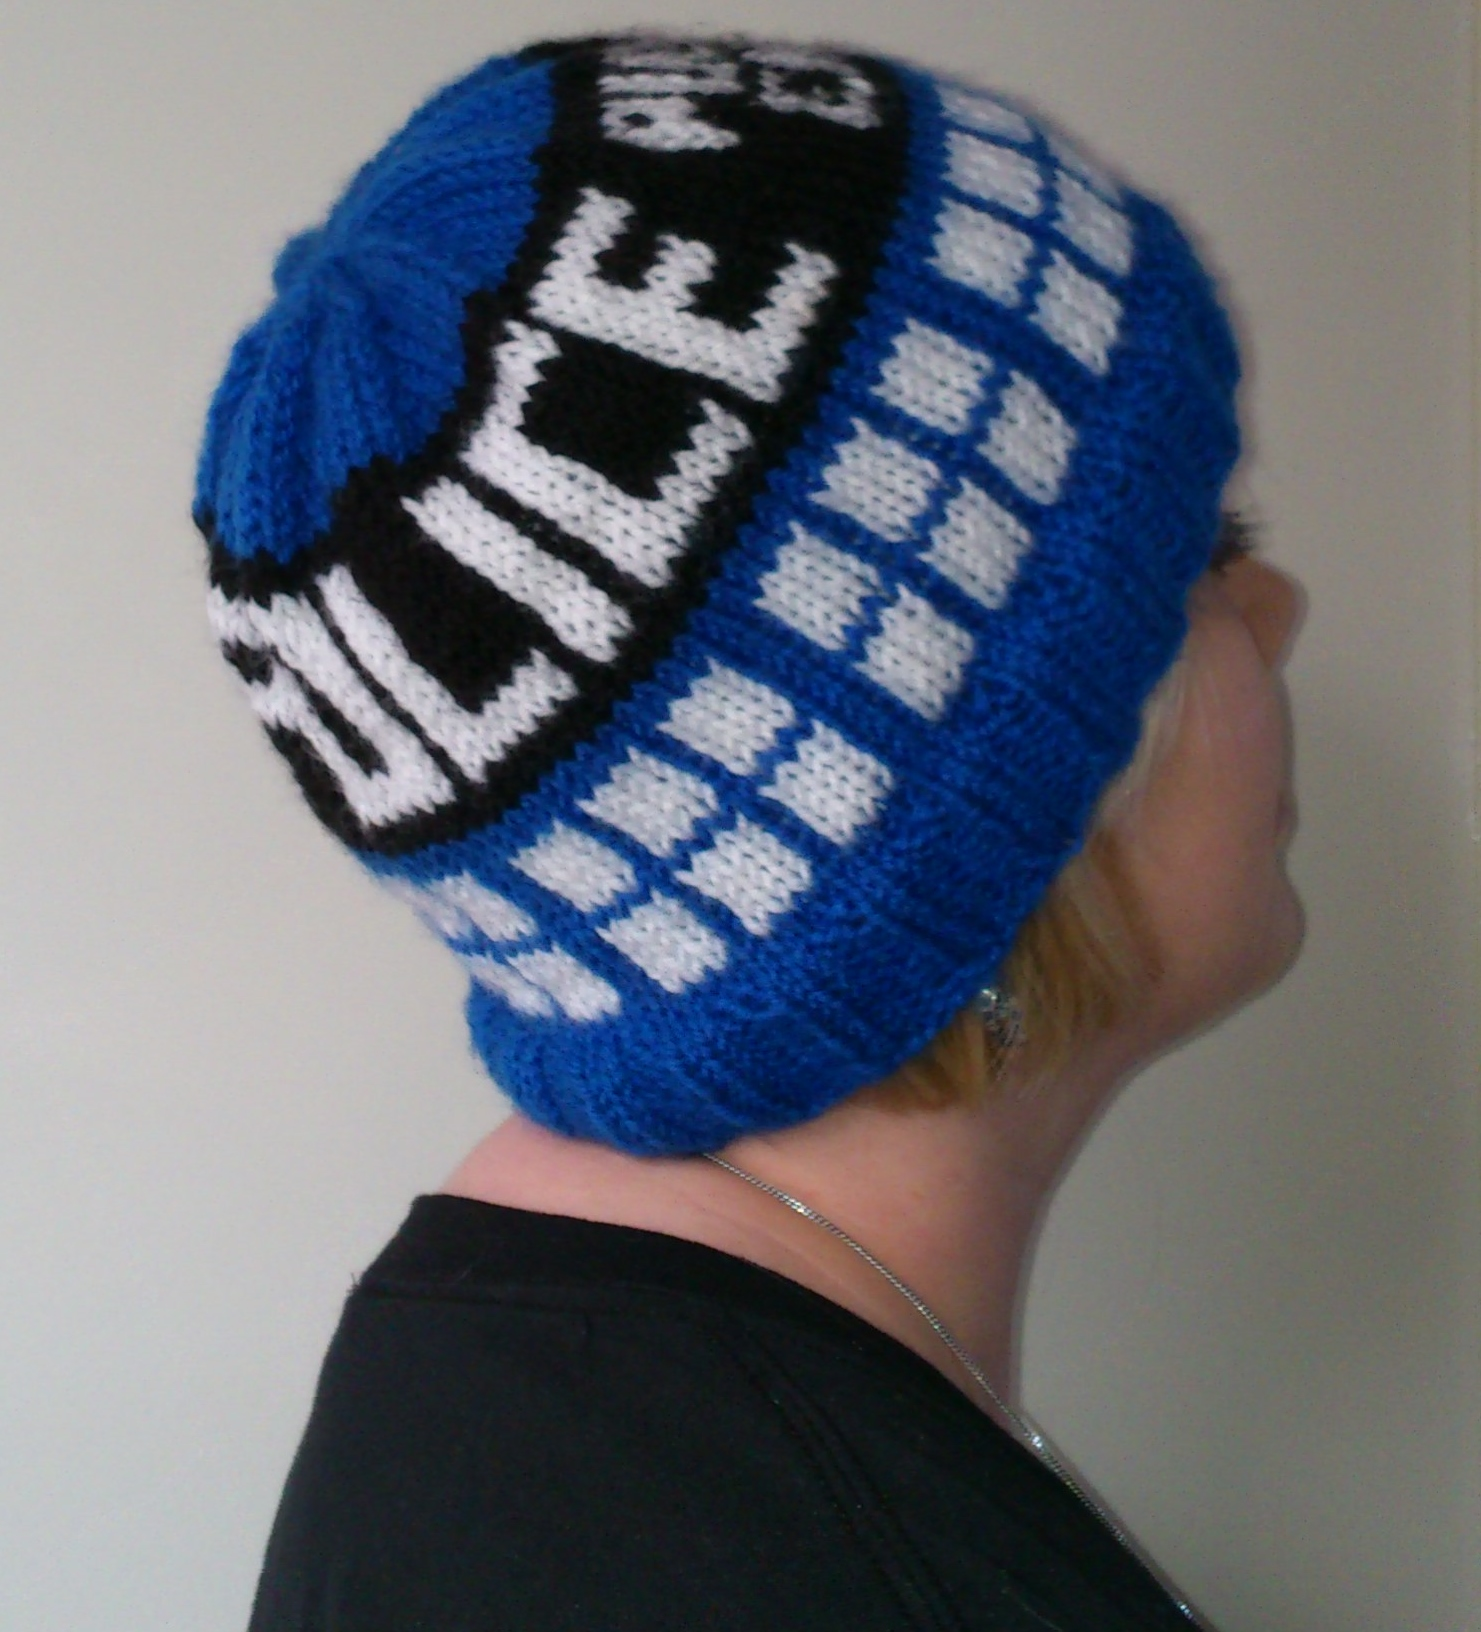 Free Crochet Pattern Tardis Hat : Knit Tardis Hat www.galleryhip.com - The Hippest Pics